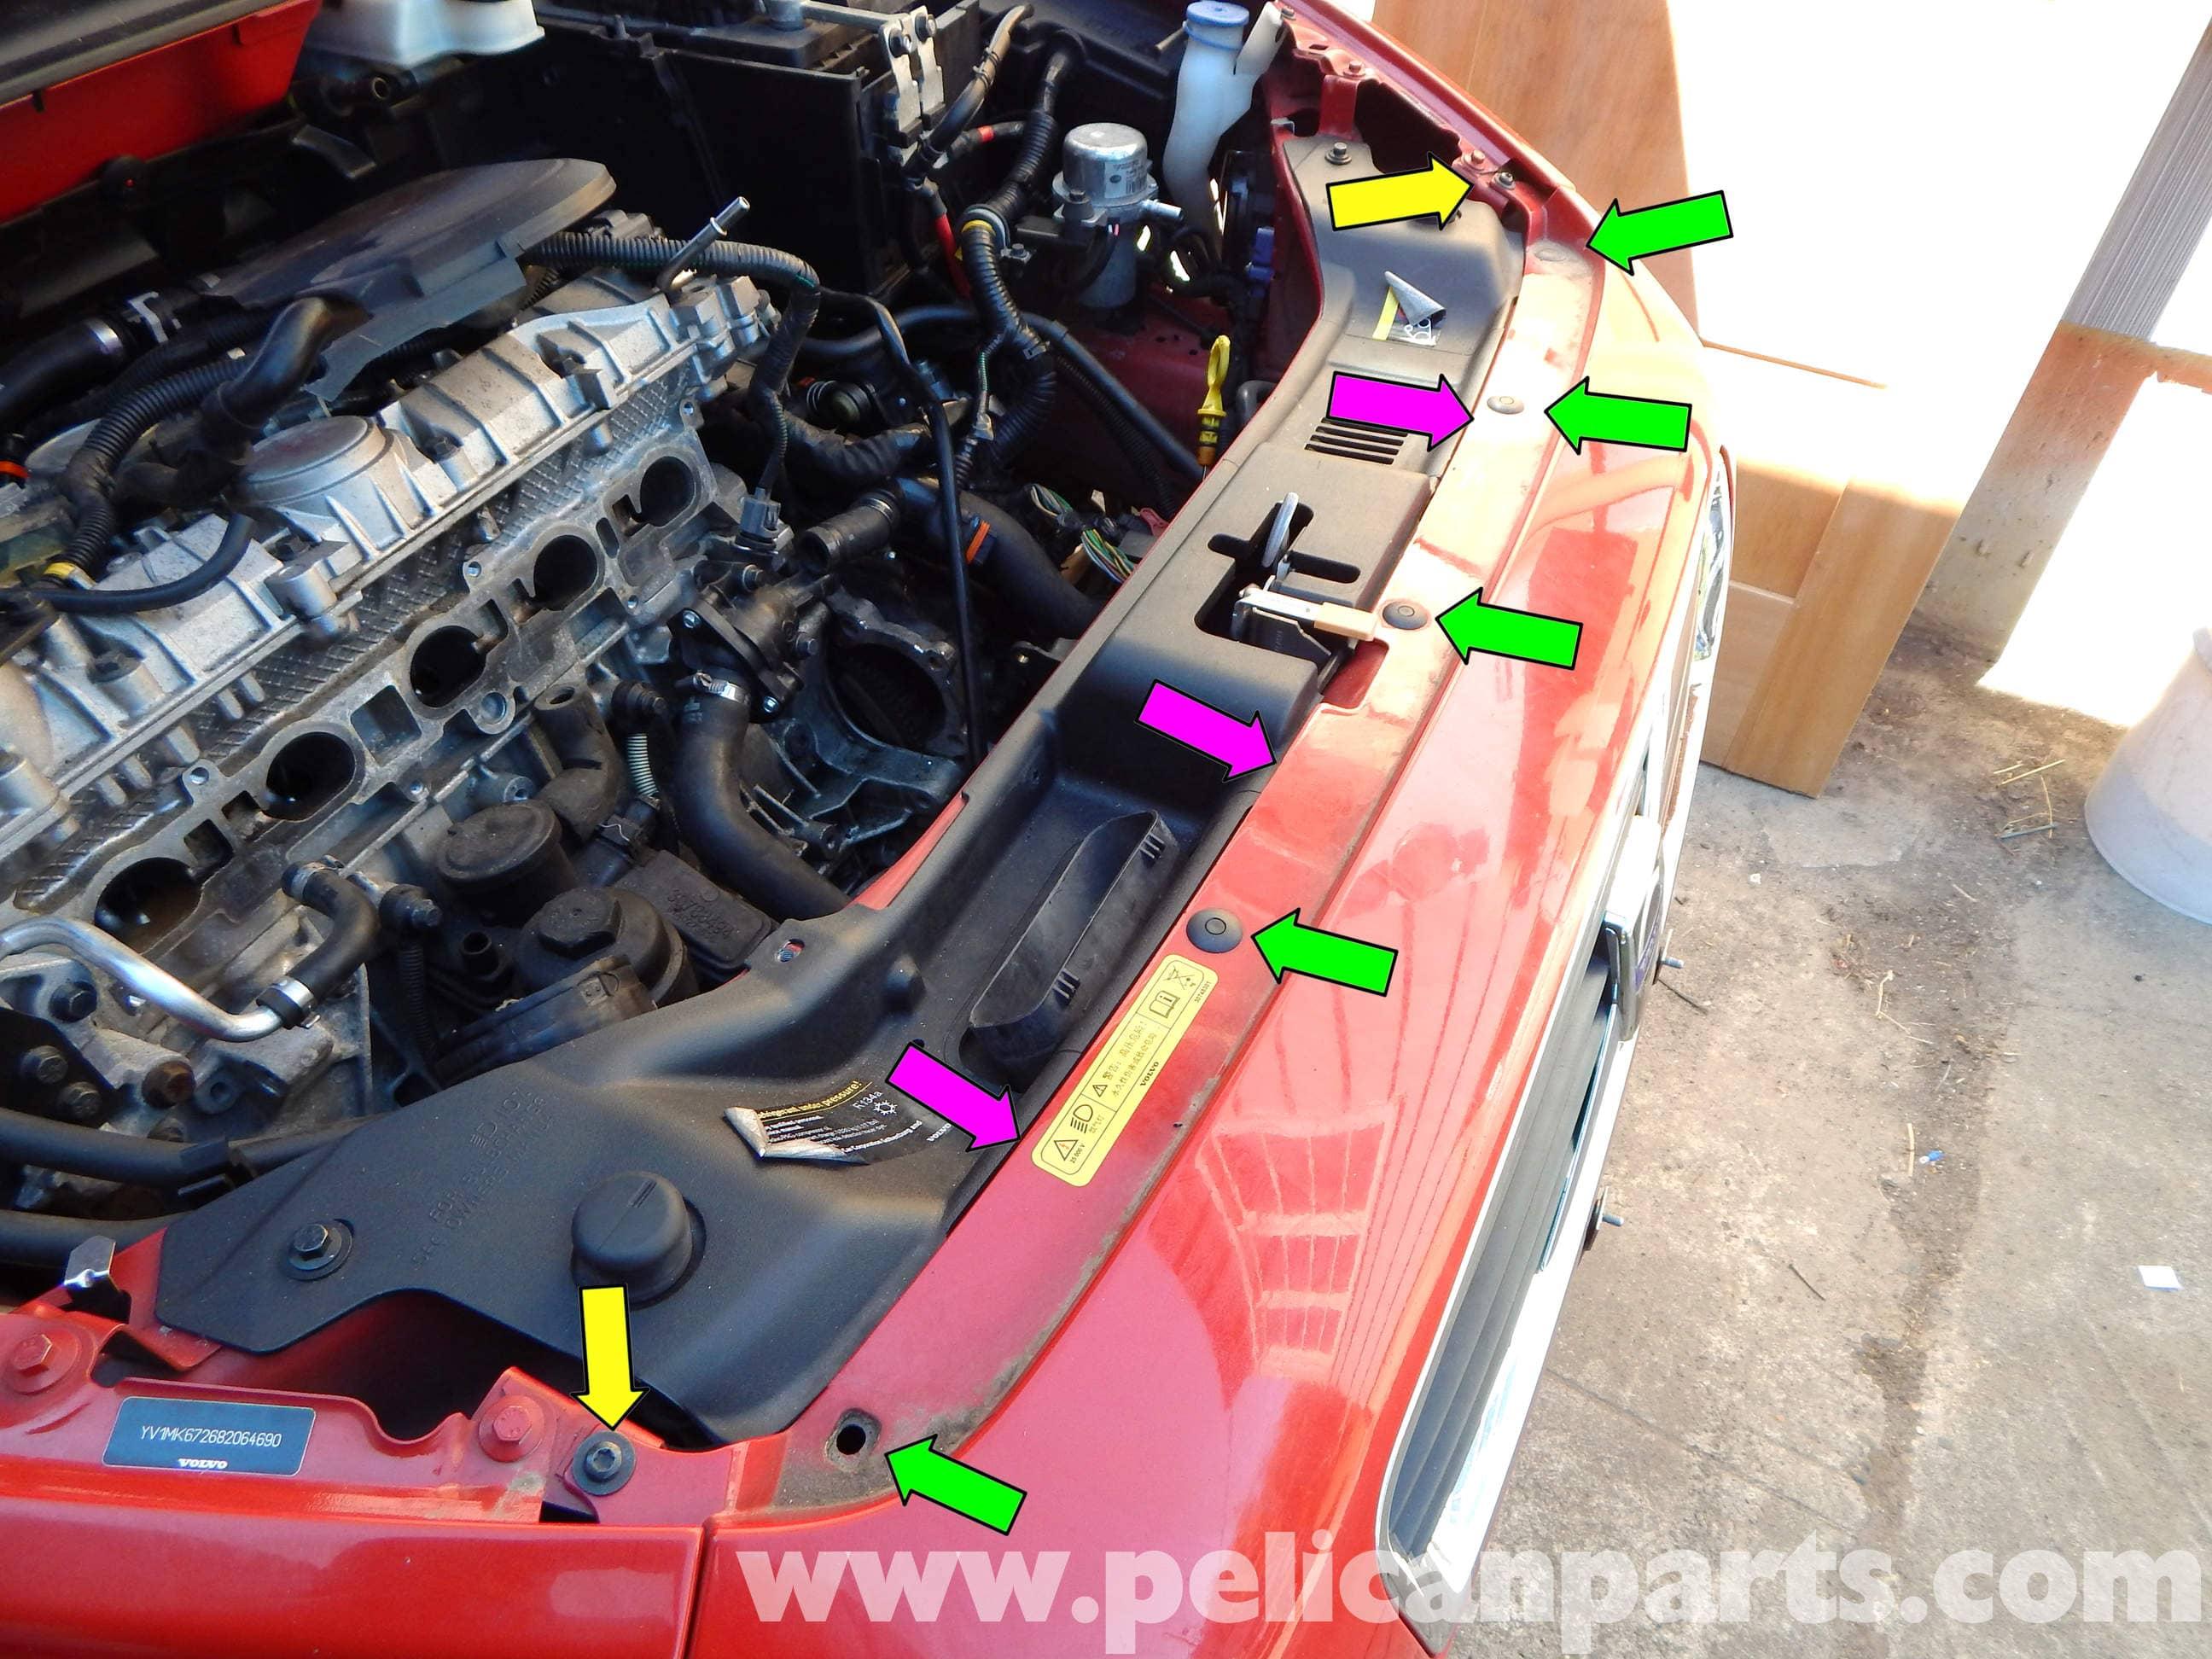 Volvo C30 Front Bumper Cover Removal  2007-2013